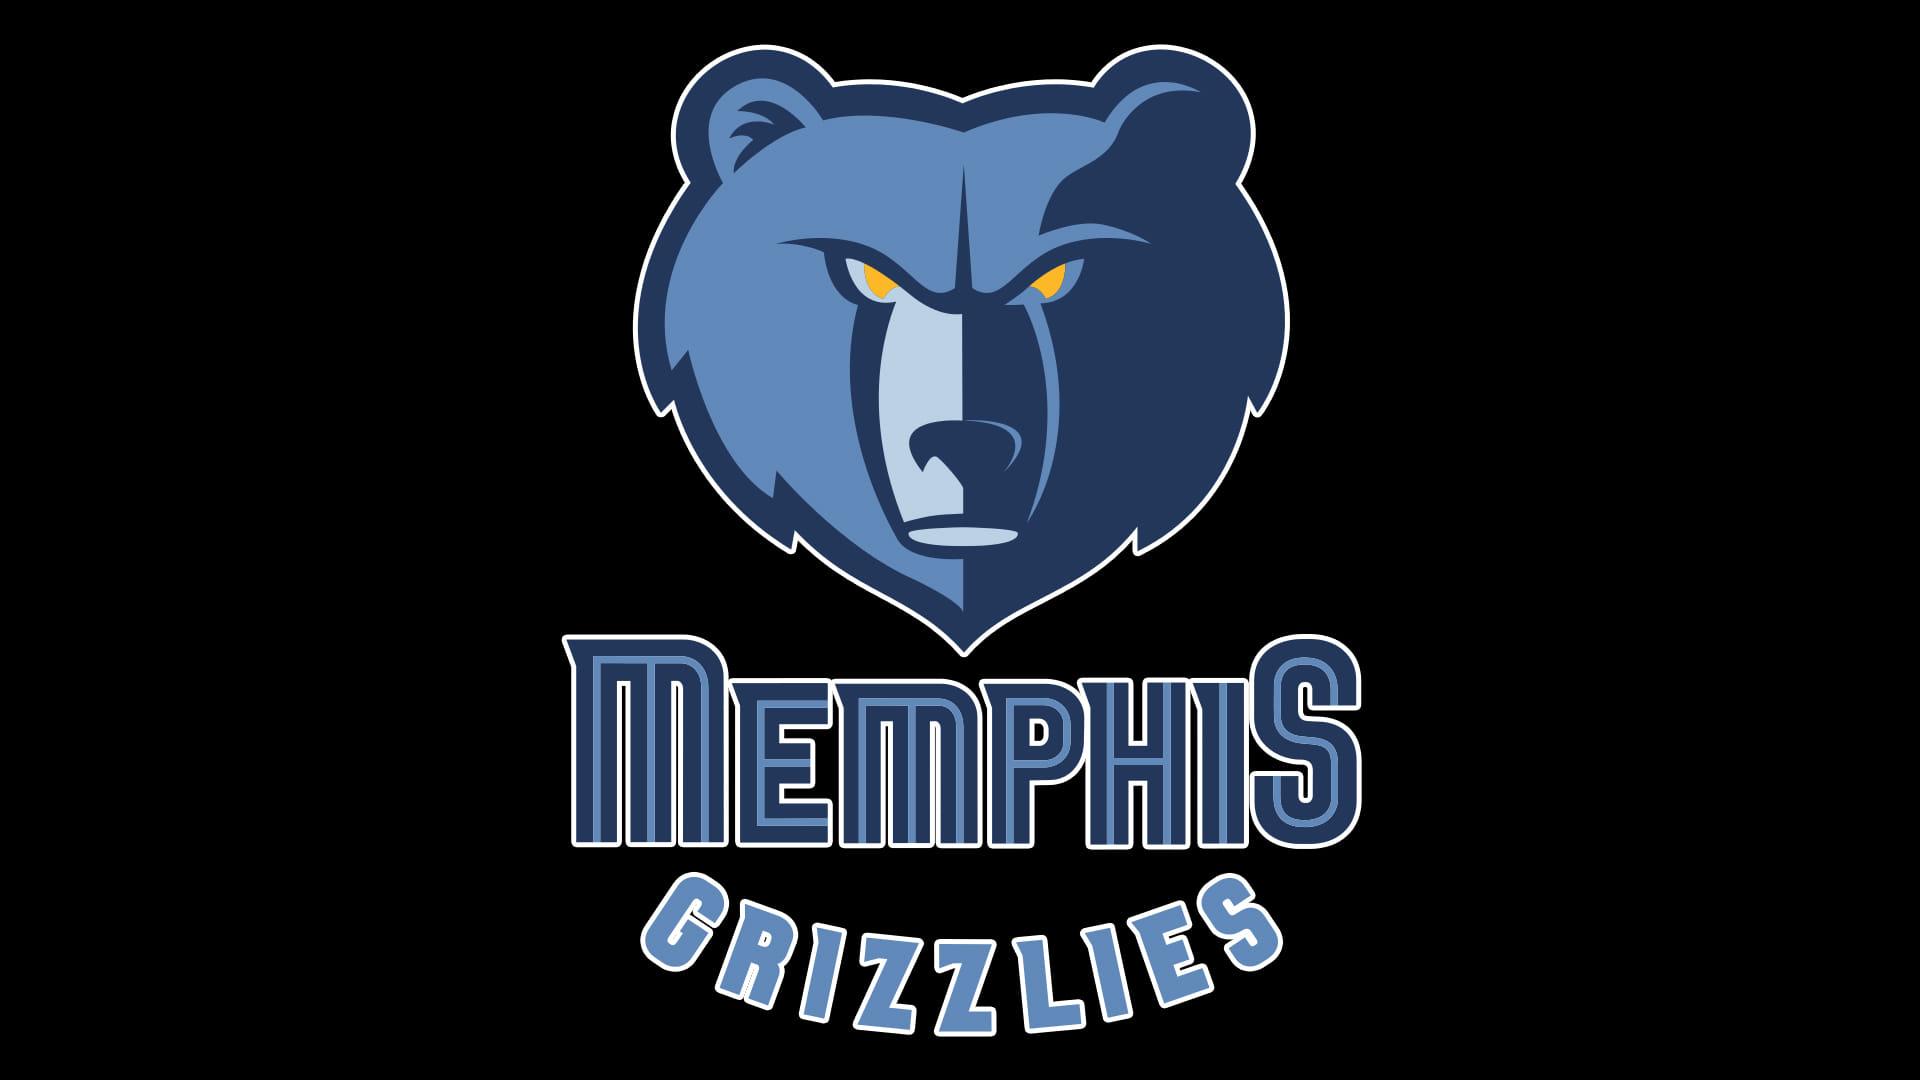 Modnyj rejting klubnyh emblem NBA 6. Memphis Grizzlies